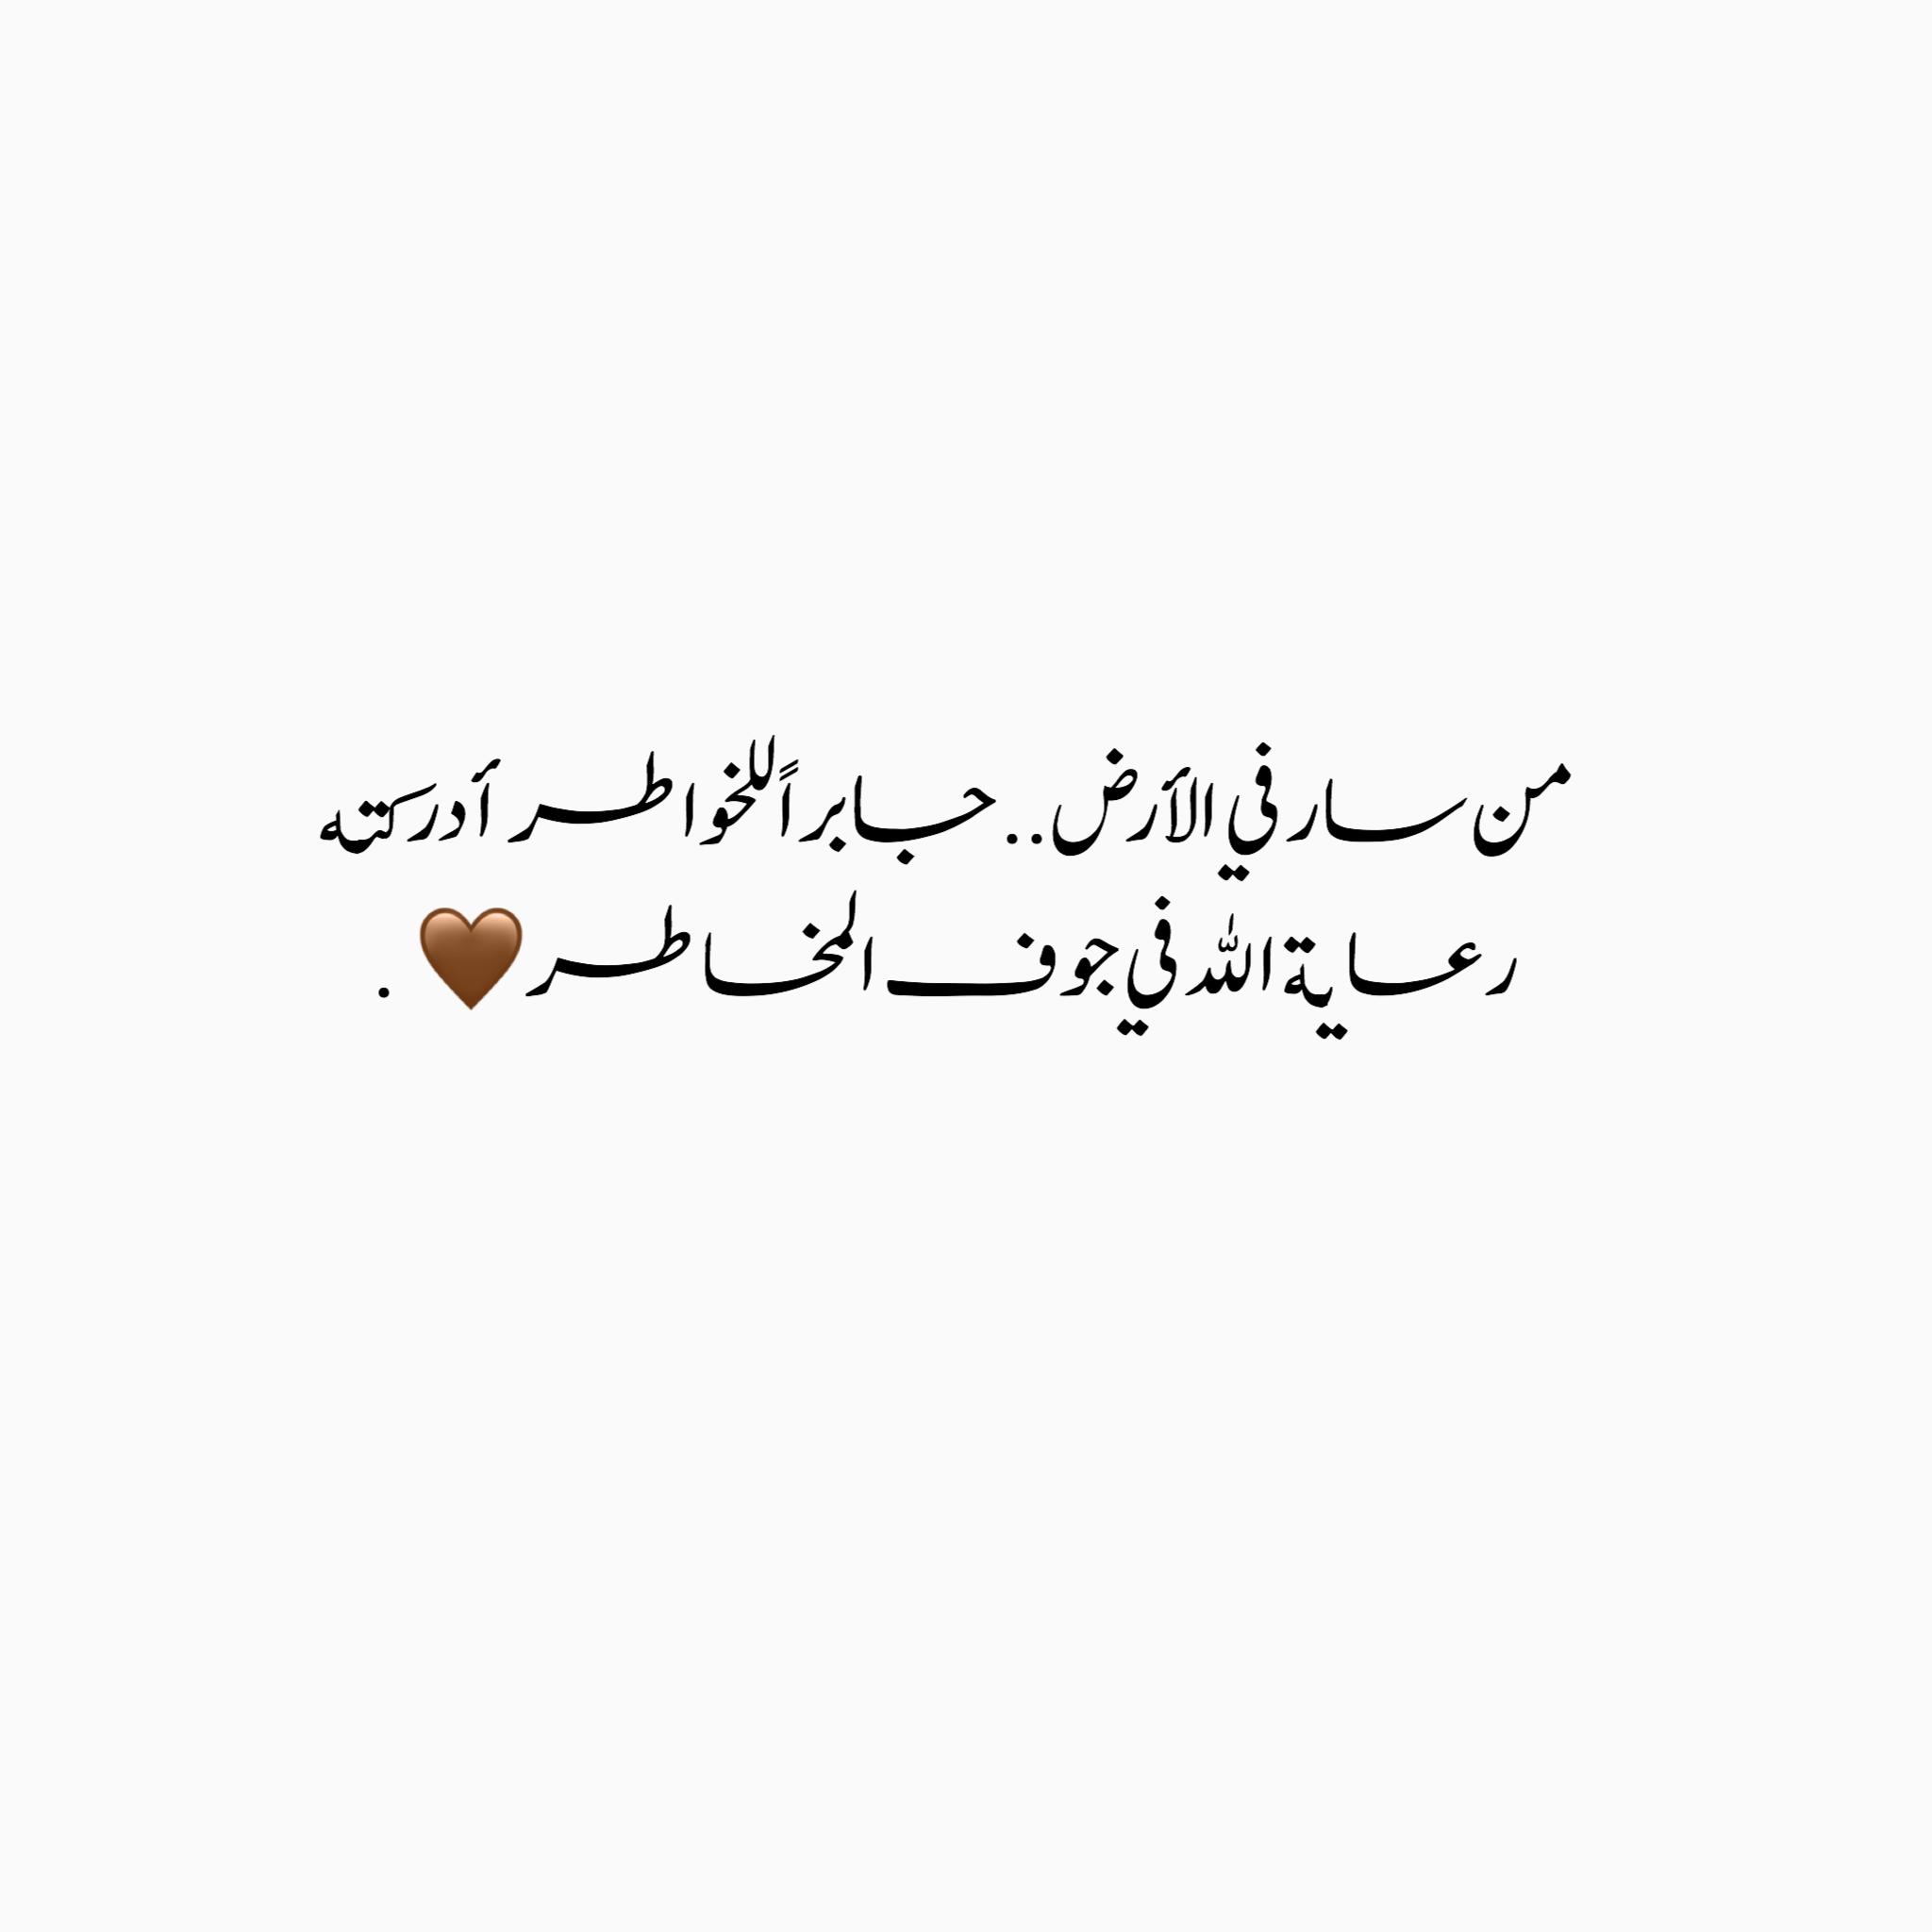 Twitter Smai9x Arabic Tattoo Quotes Islamic Phrases Beautiful Arabic Words